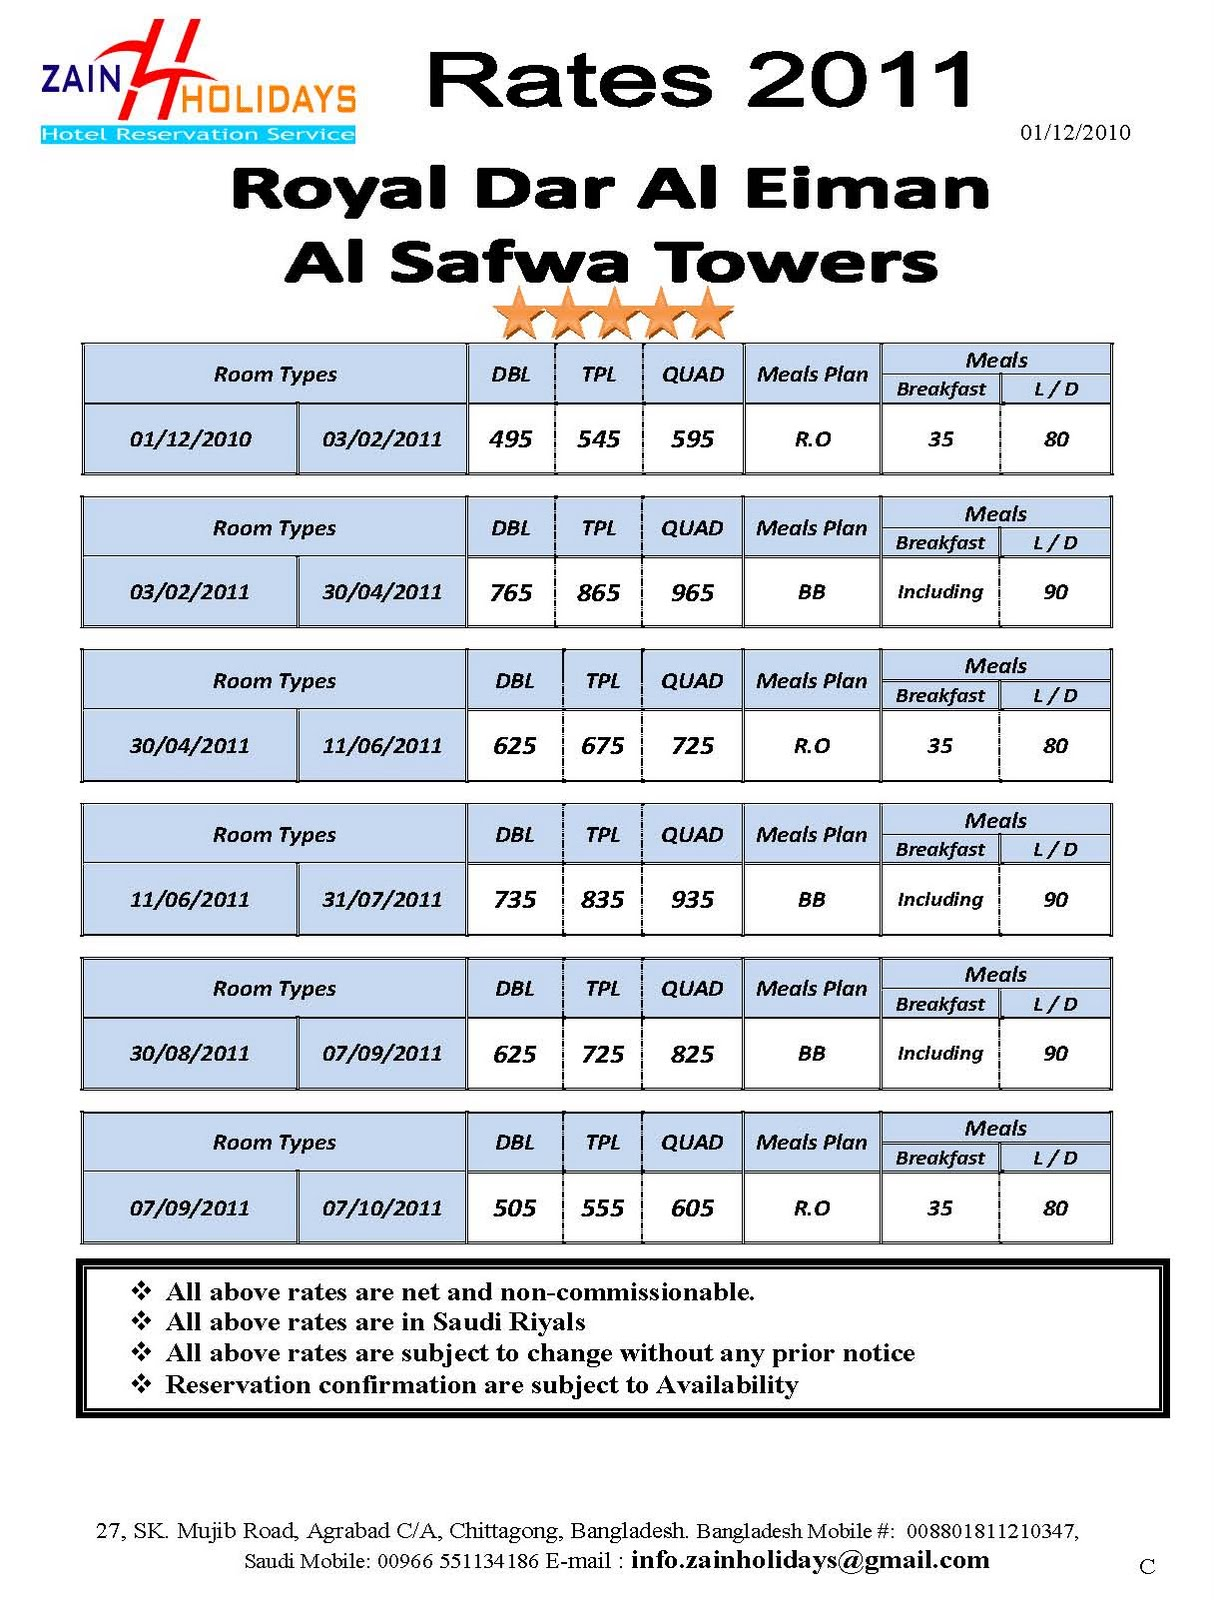 Makkah hotel rates 2011